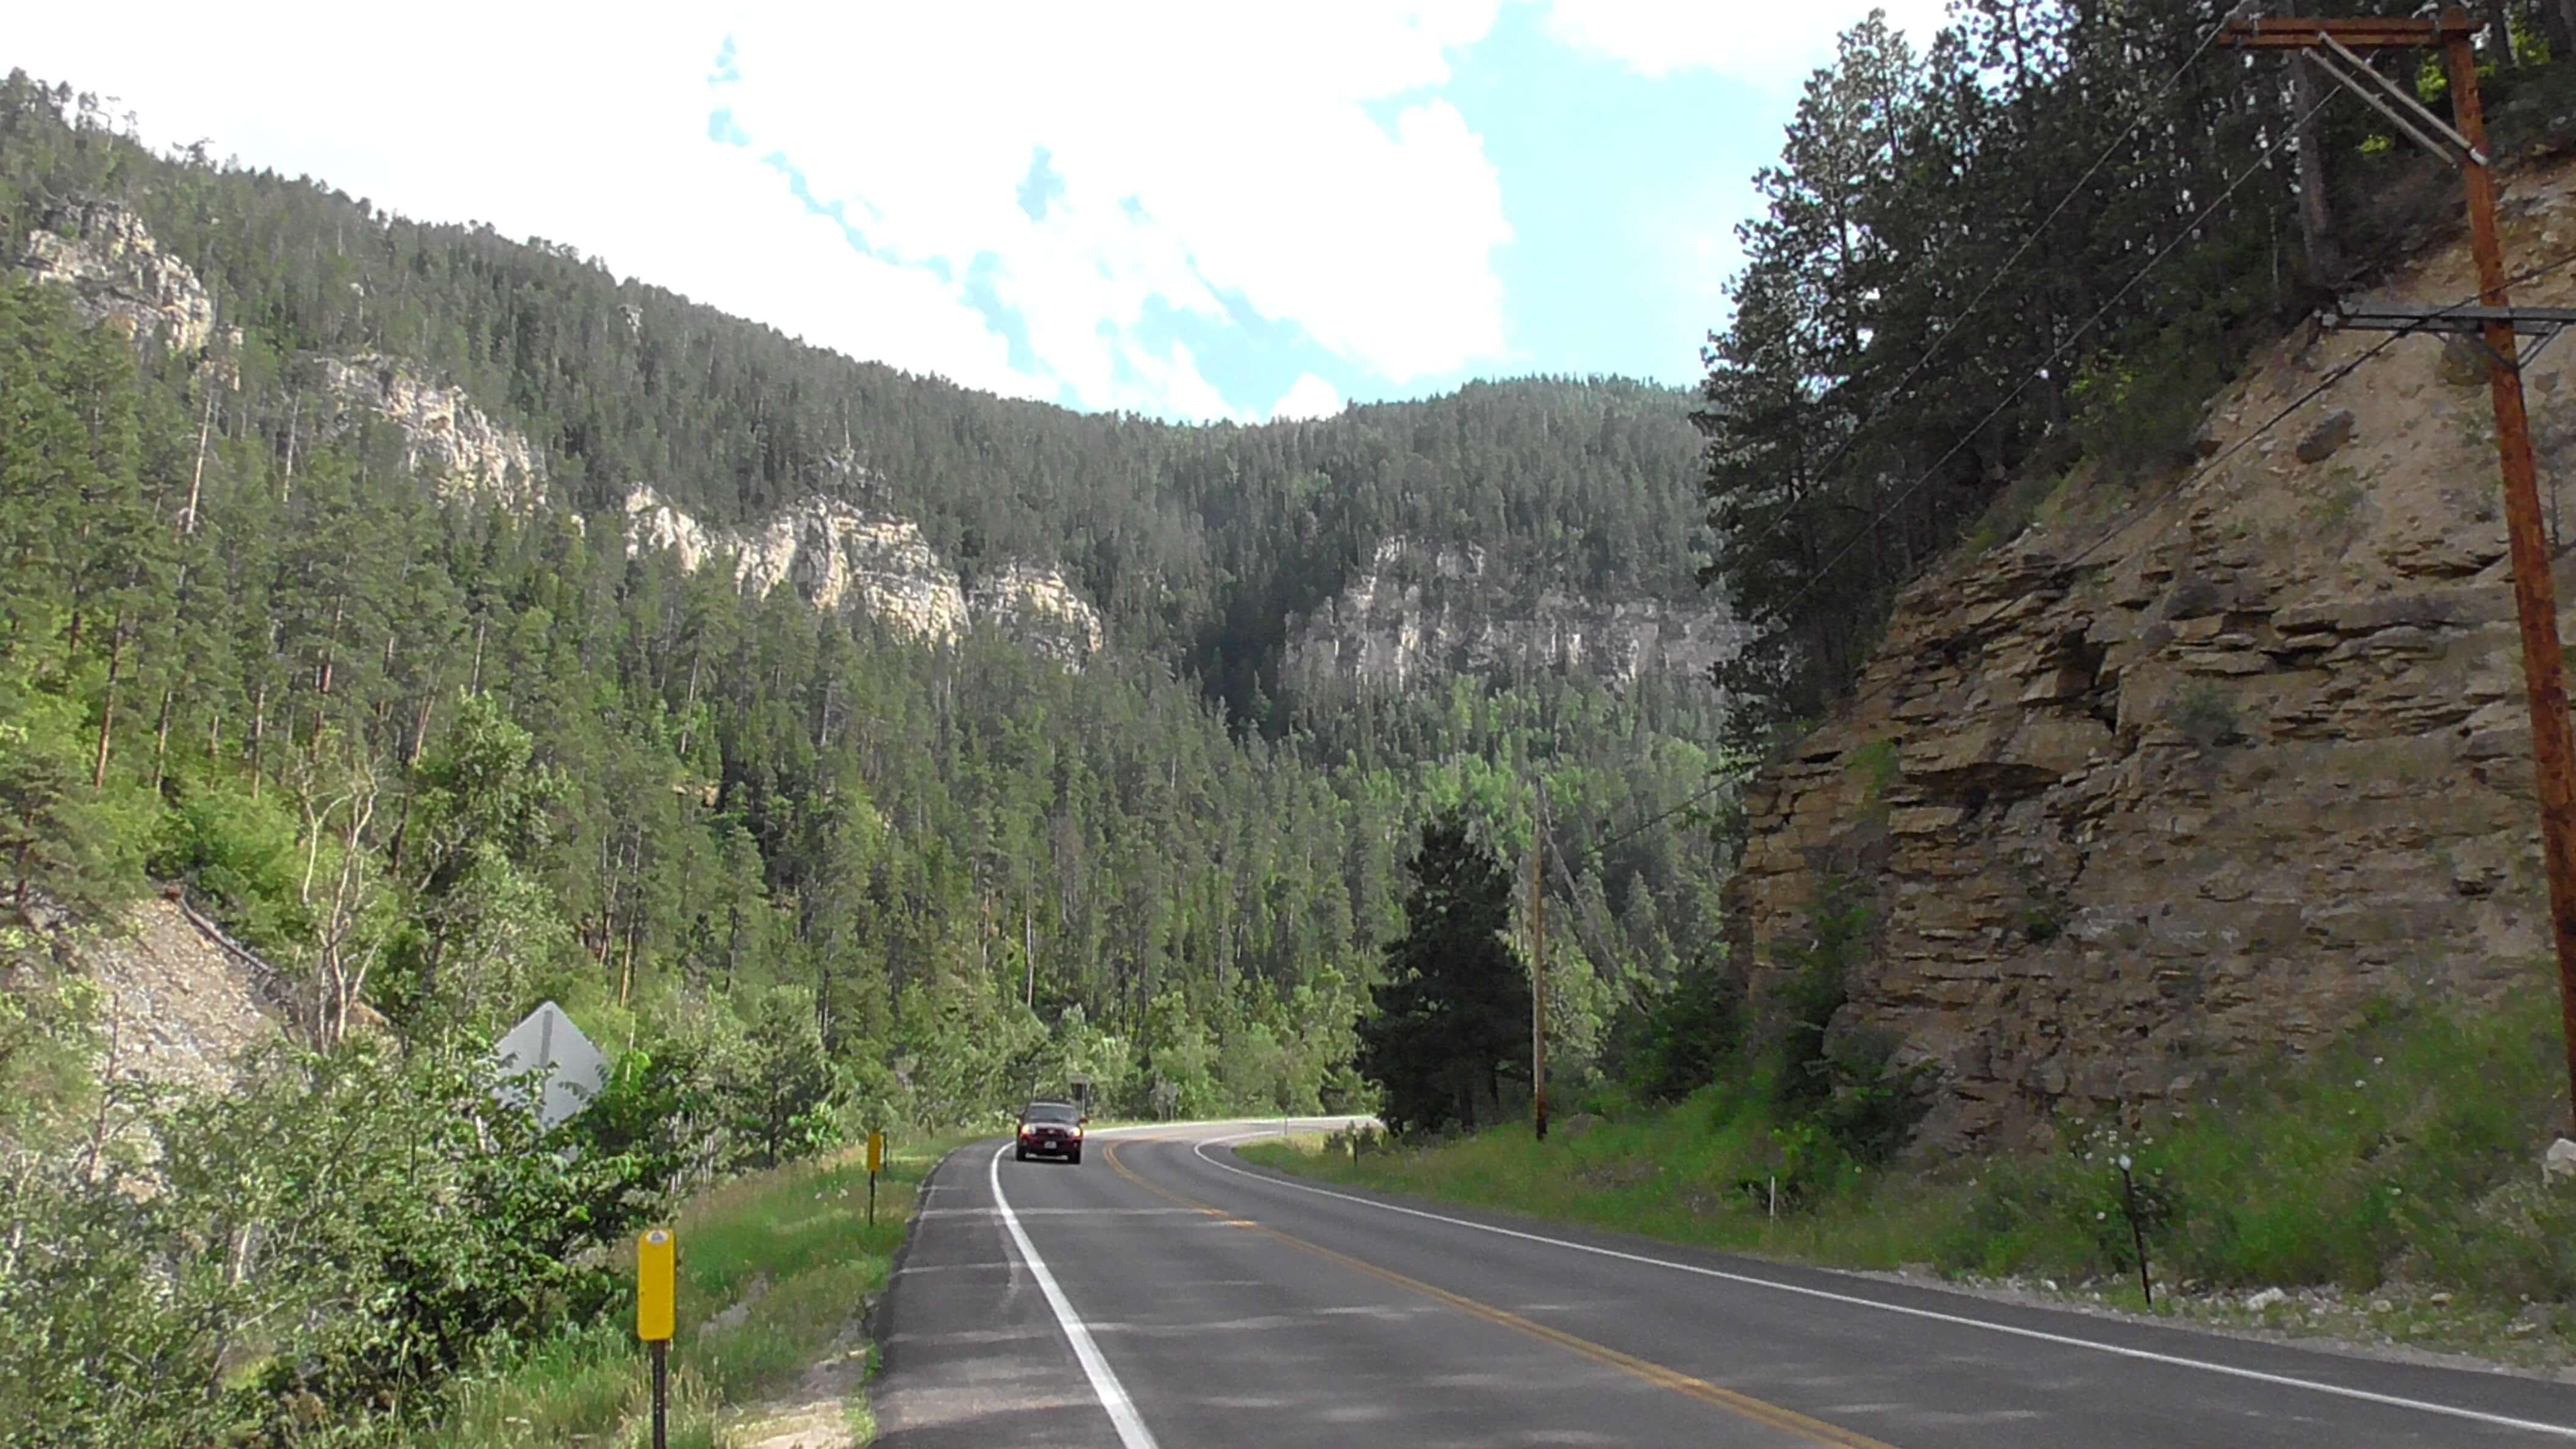 Spearfish Canyon, ND